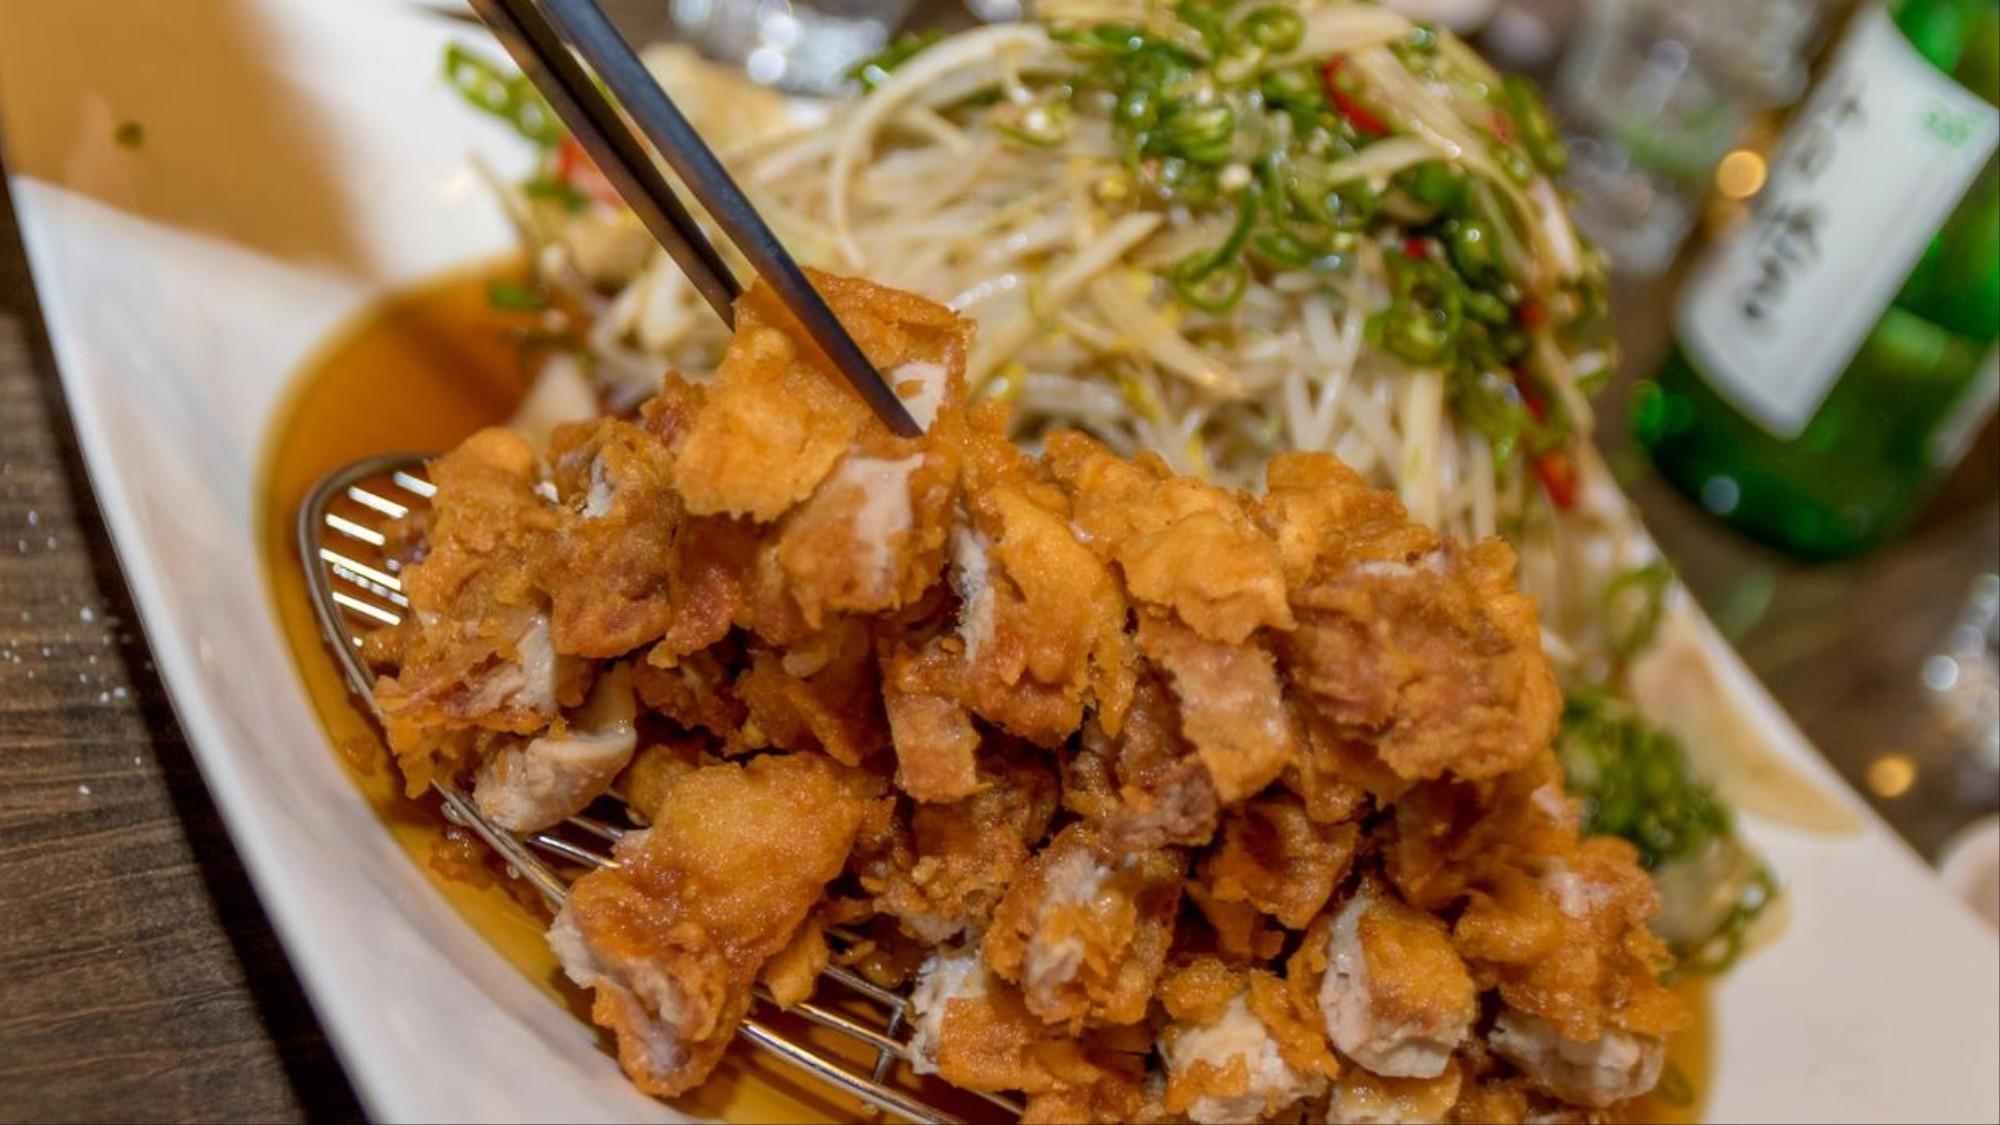 Penyebab Orang Korea Gemar Sekali Makan Ayam Goreng Dan Minum Bir